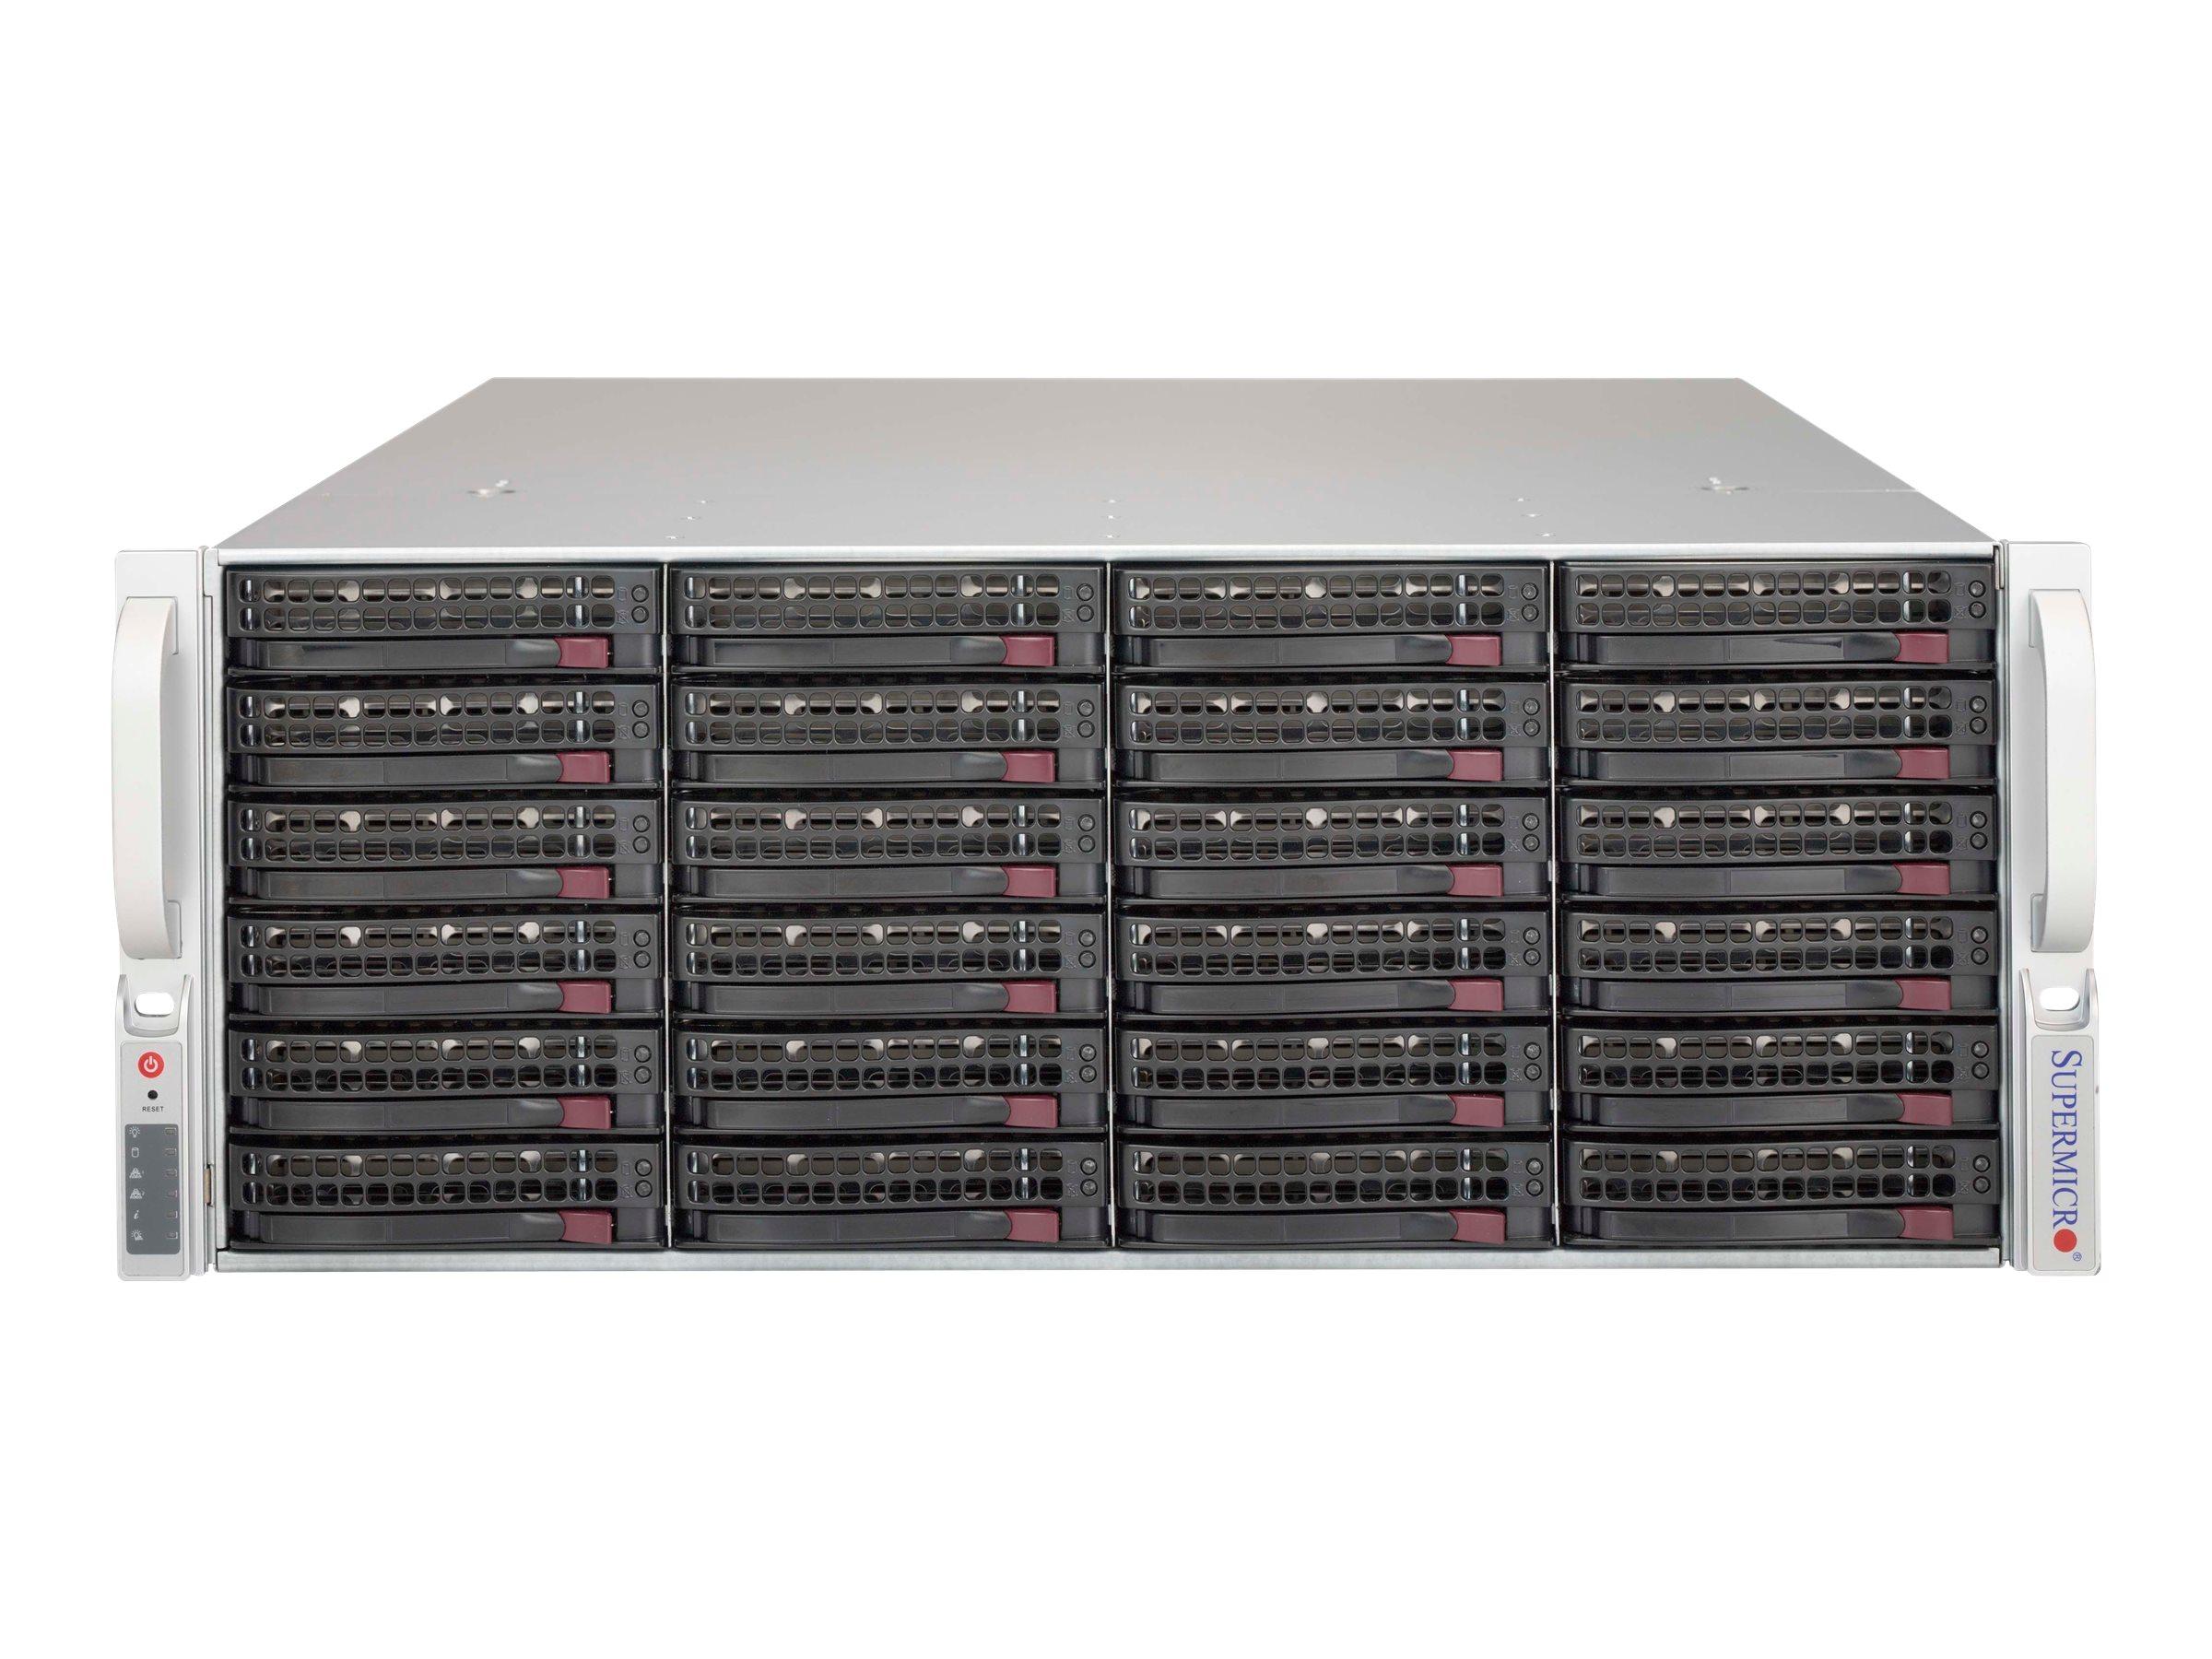 Supermicro SC846 BE1C-R1K03JBOD - Rack-Montage - 4U - SATA/SAS - Hot-Swap 1000 Watt - Schwarz